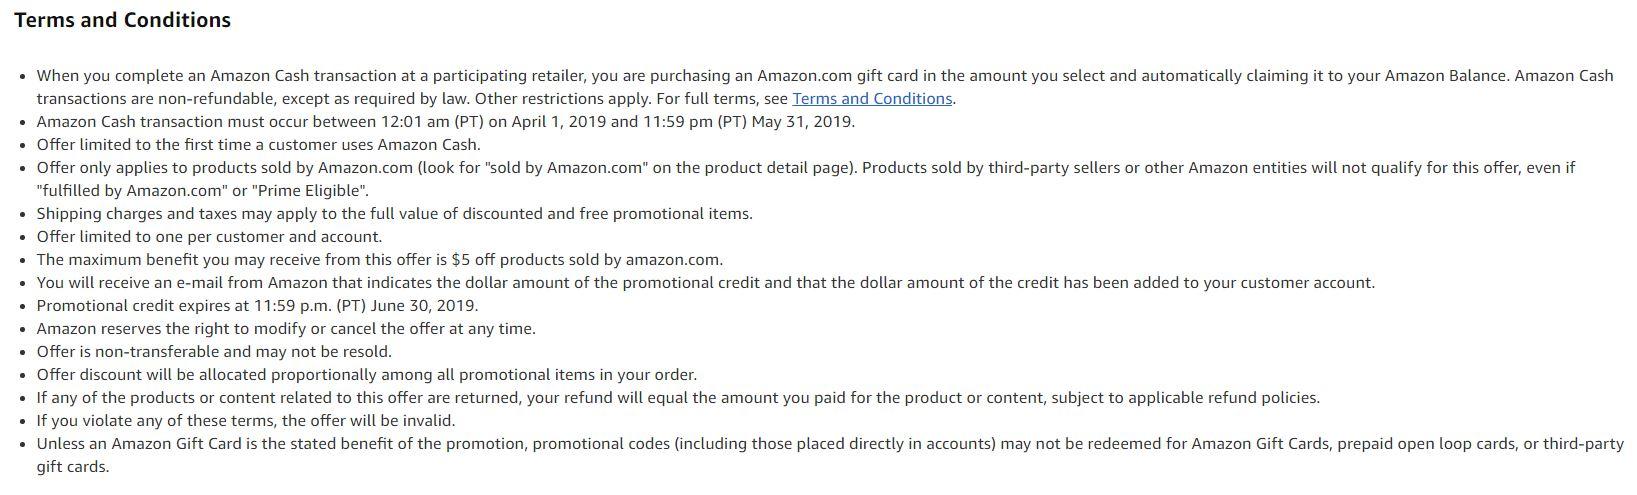 New Amazon Cash Users: Add $20 & Get a $5 Bonus